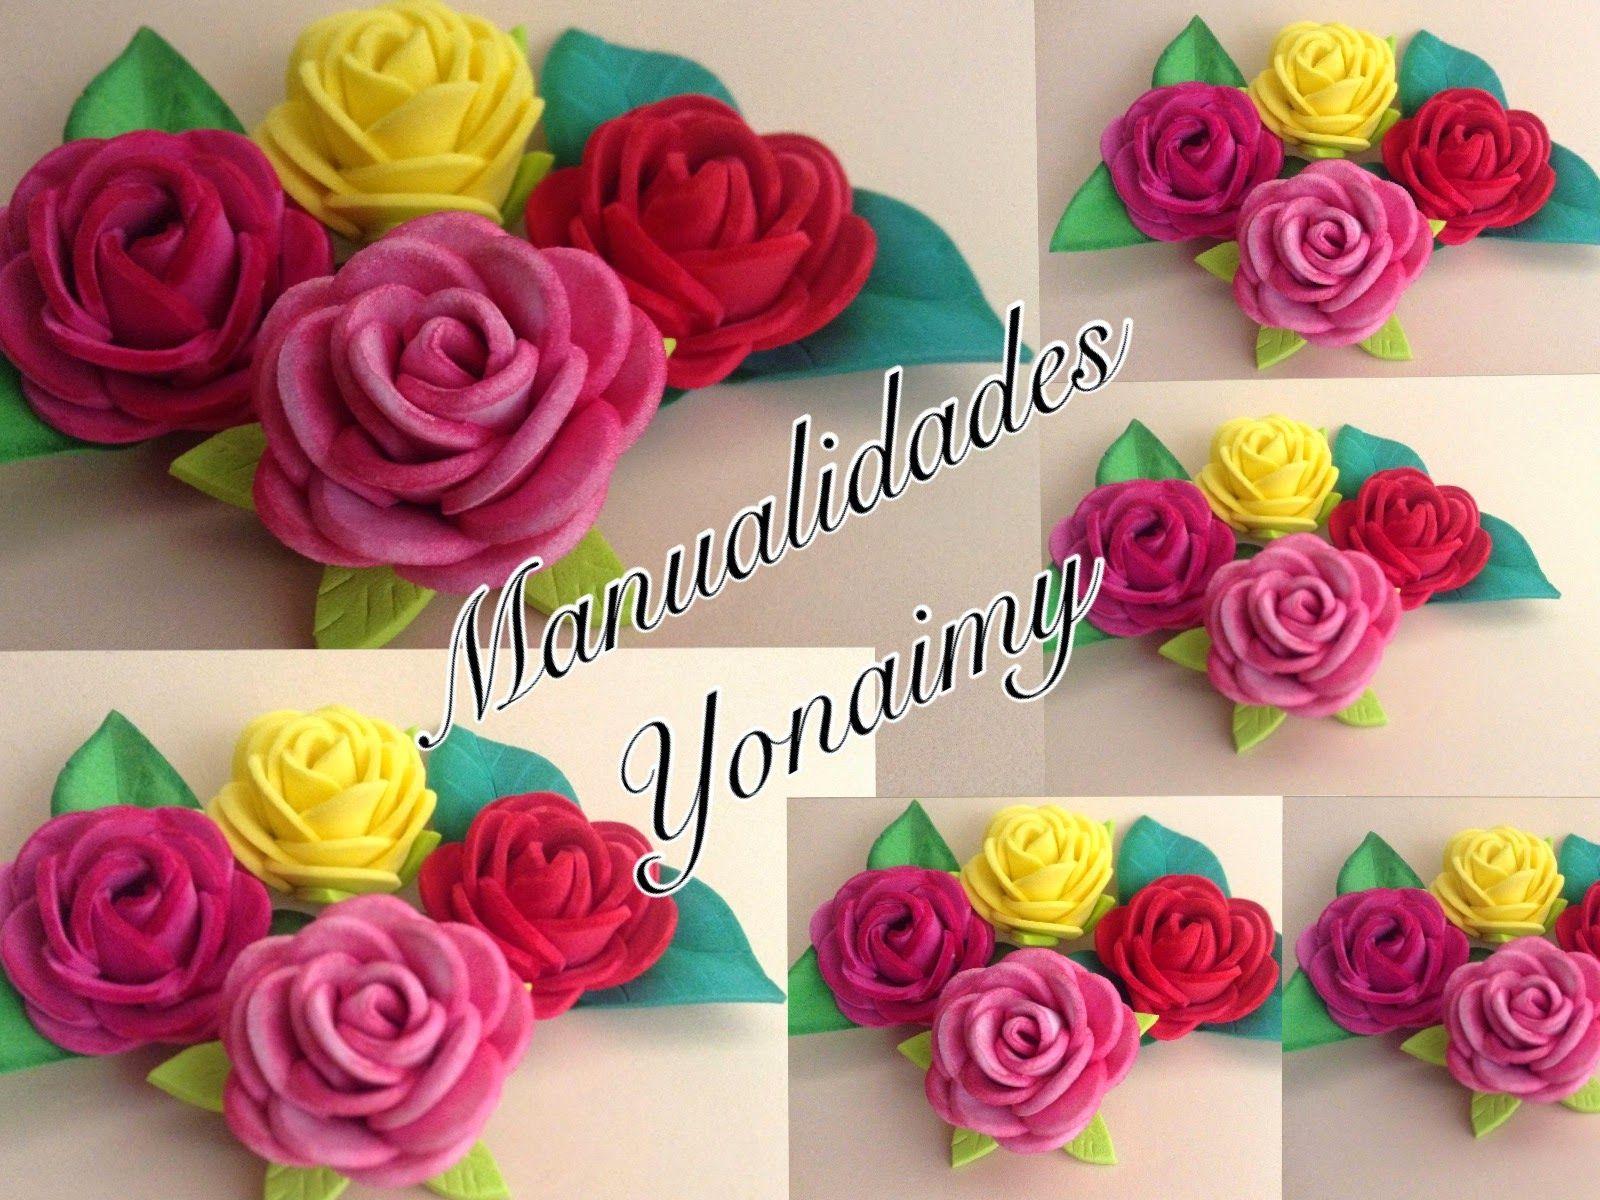 Manualidades yonaimy rosas peque as de foamy o goma eva - Flore de goma eva ...